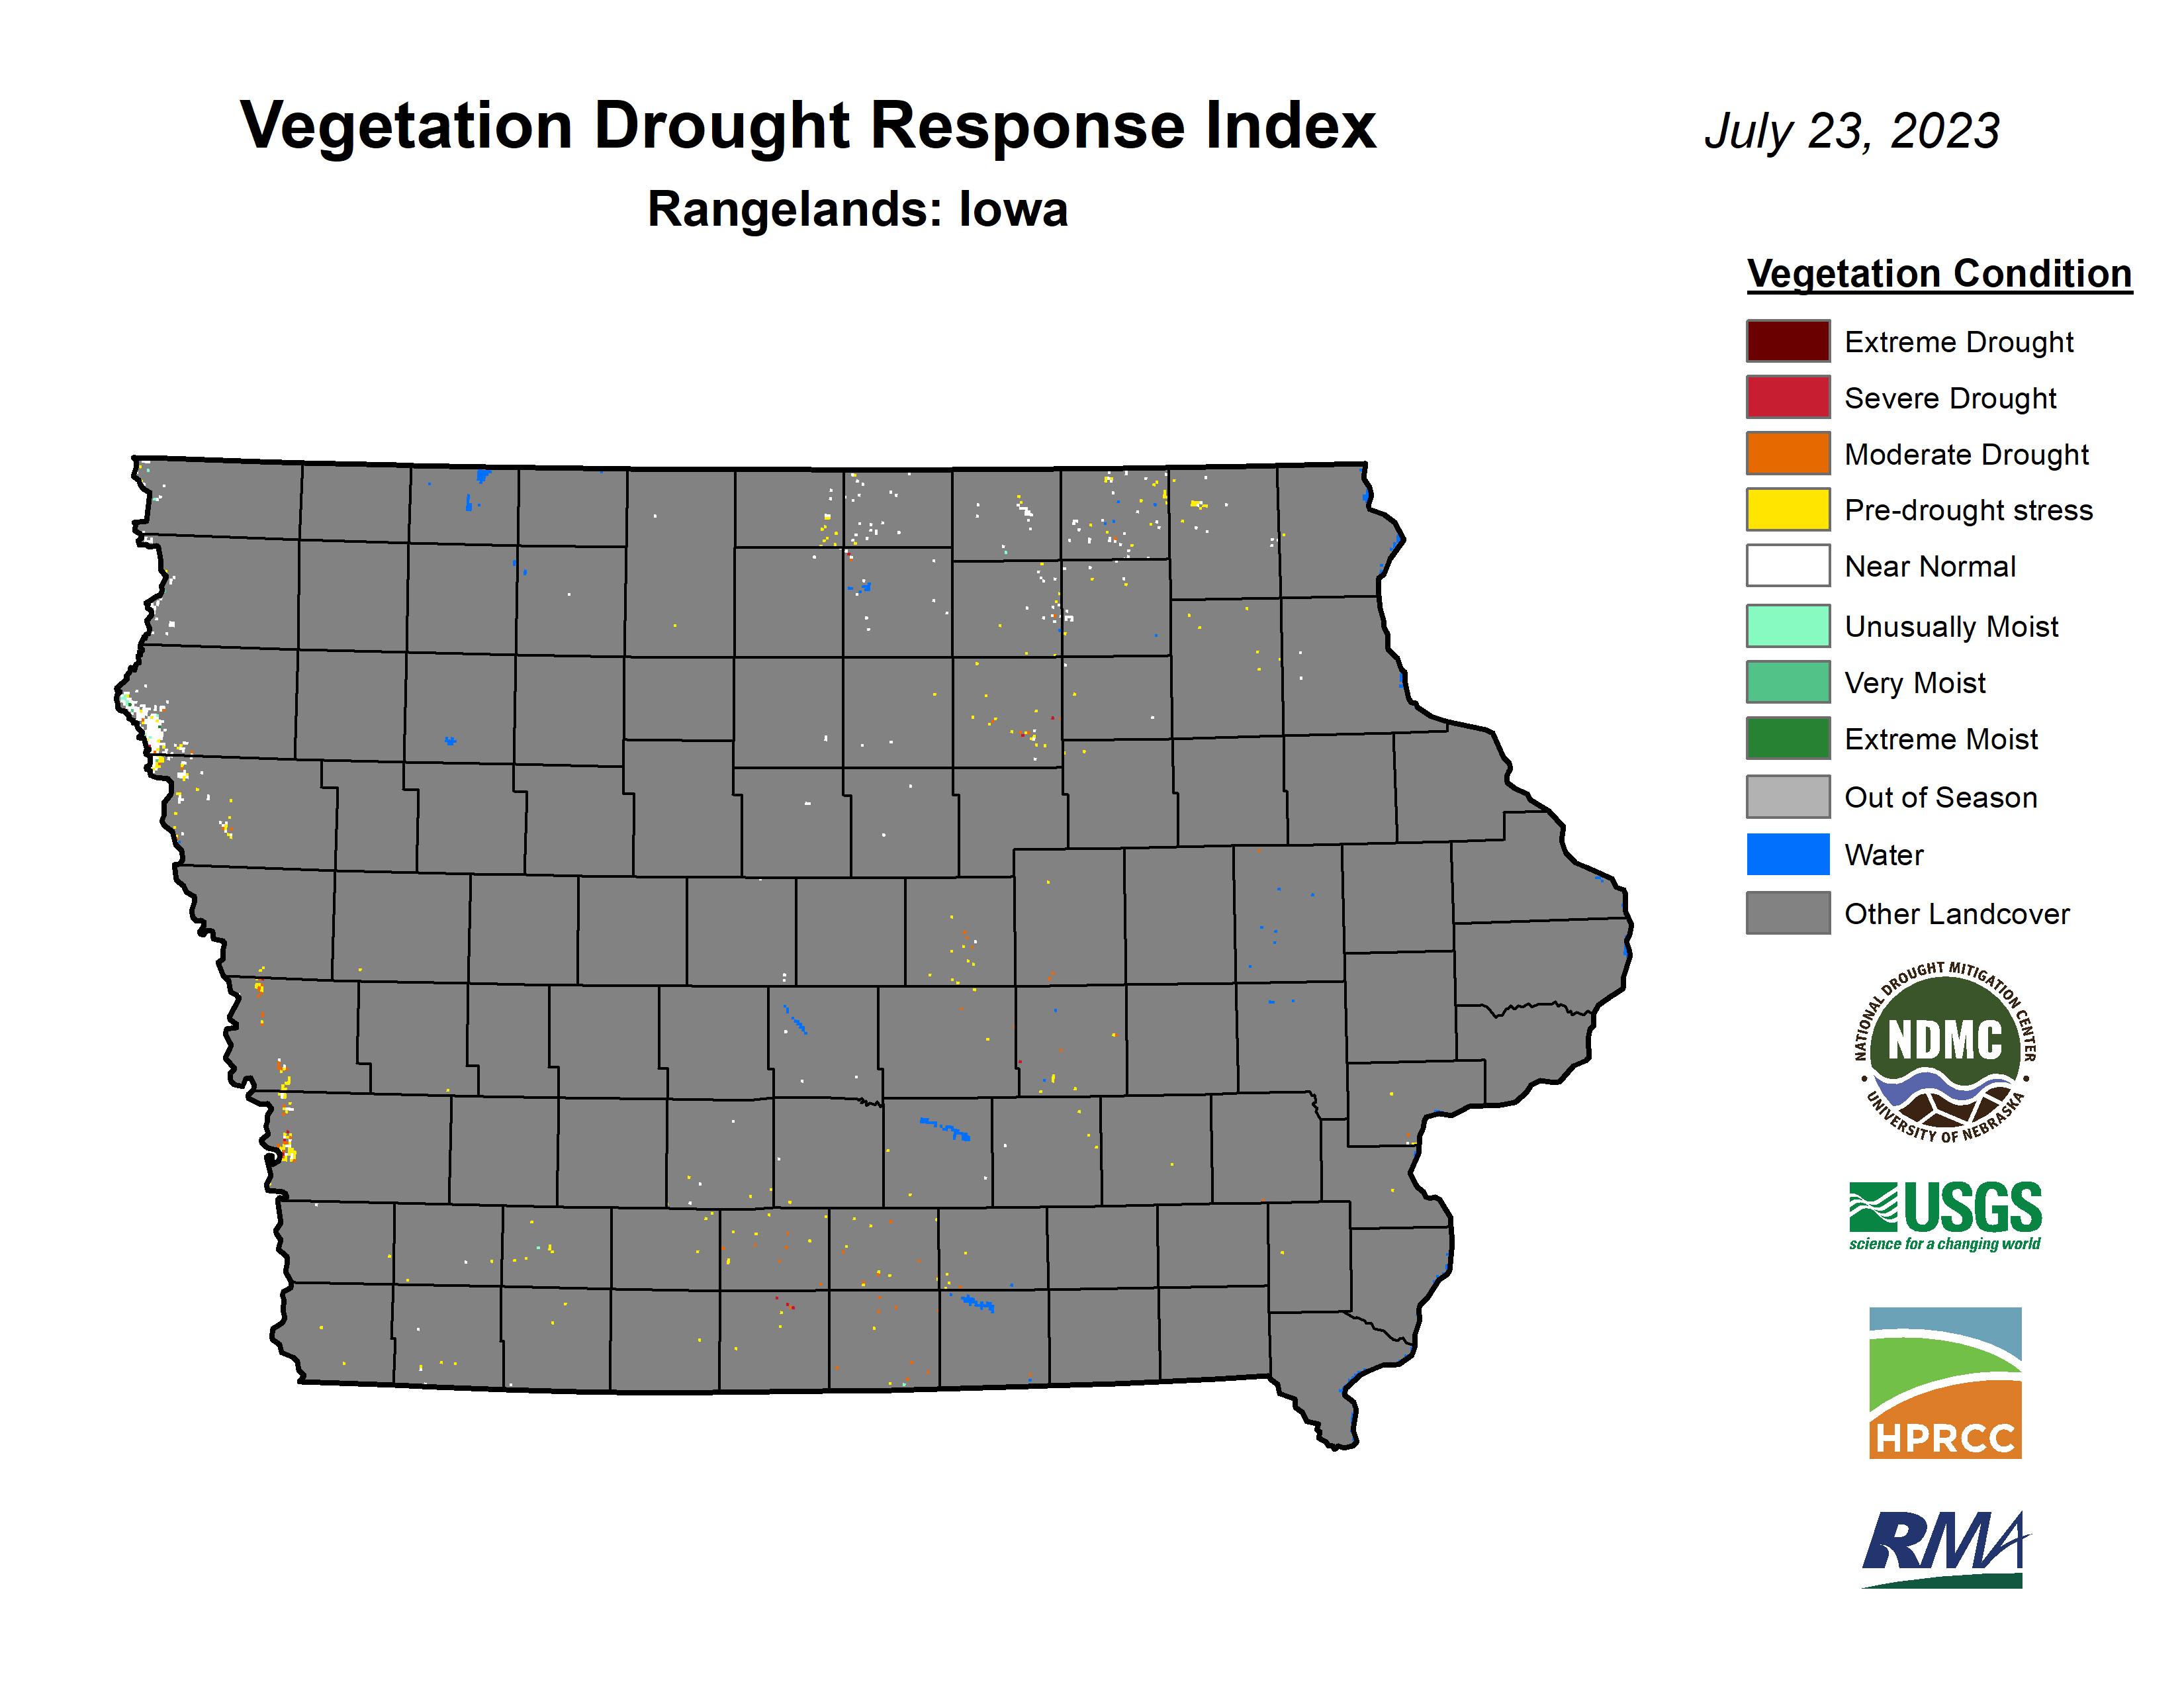 Vegetation Drought Response Index (VegDRI), rangeland, Iowa